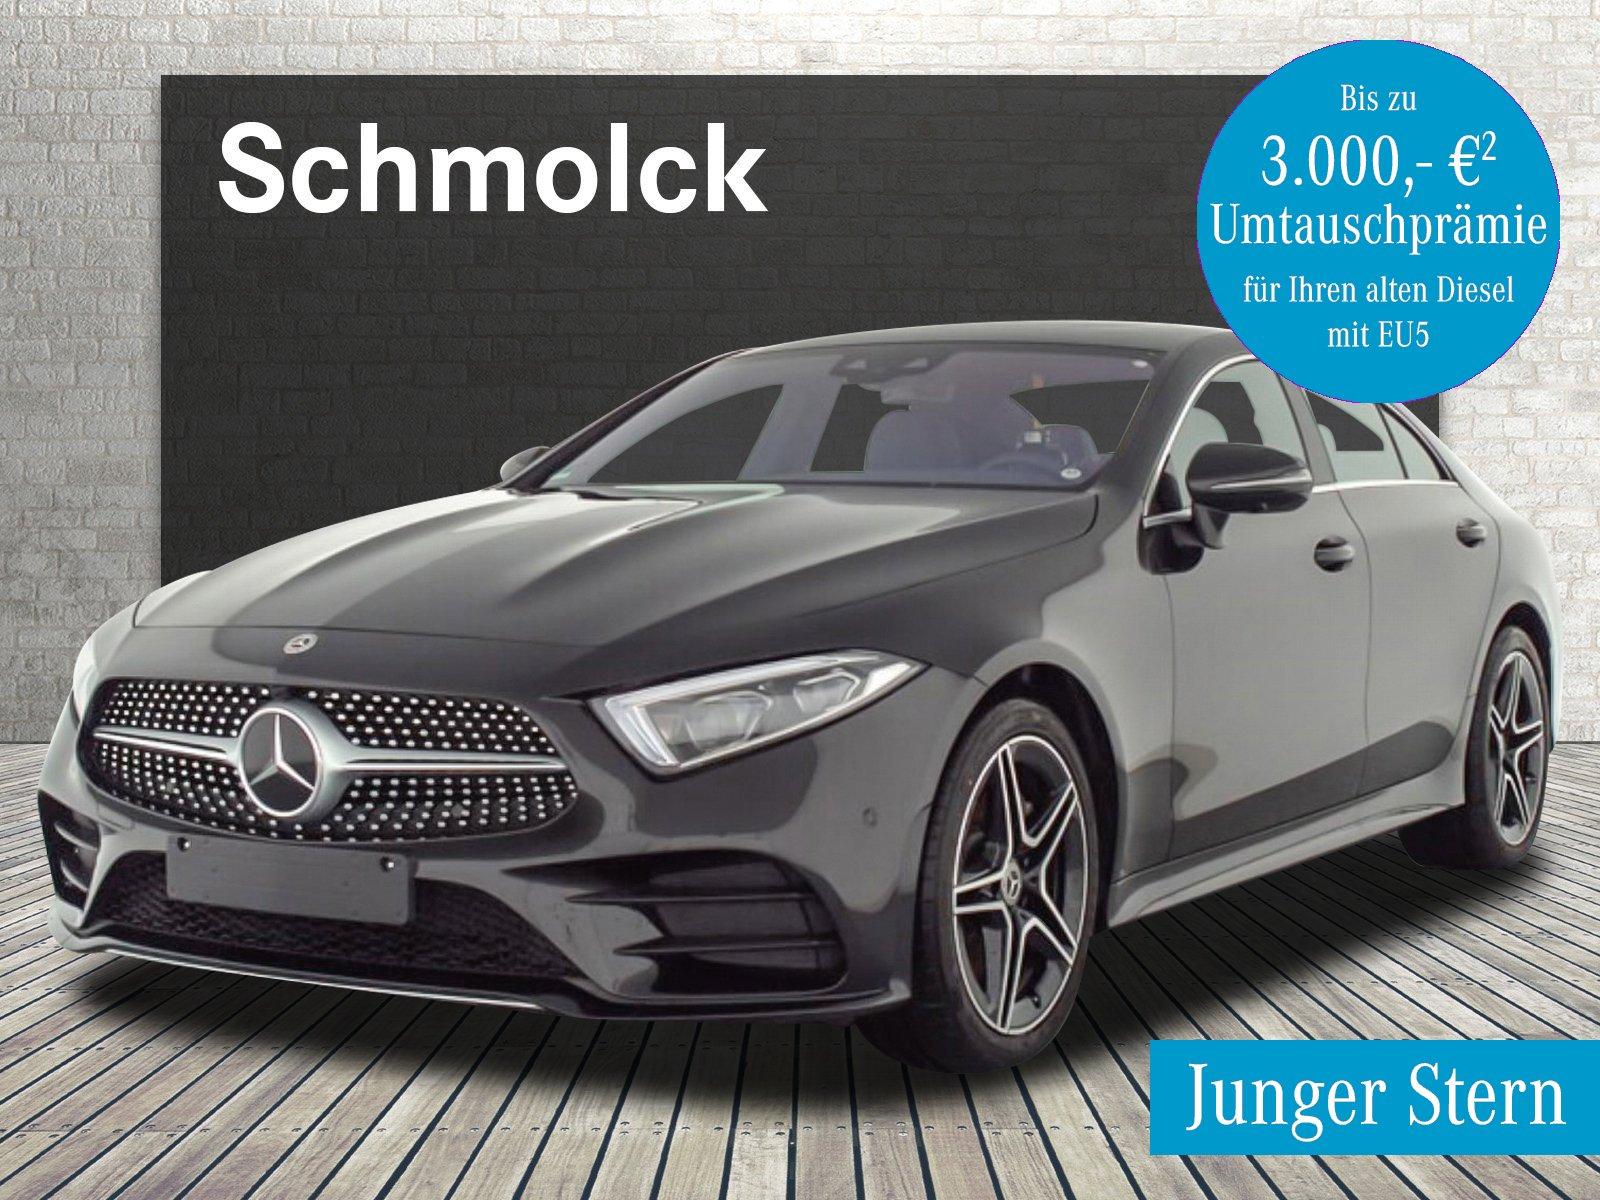 Mercedes-Benz CLS 400 d 4M AMG/FAHRASSI/STDH/BURM/SHD/SITZKLIM, Jahr 2020, Diesel